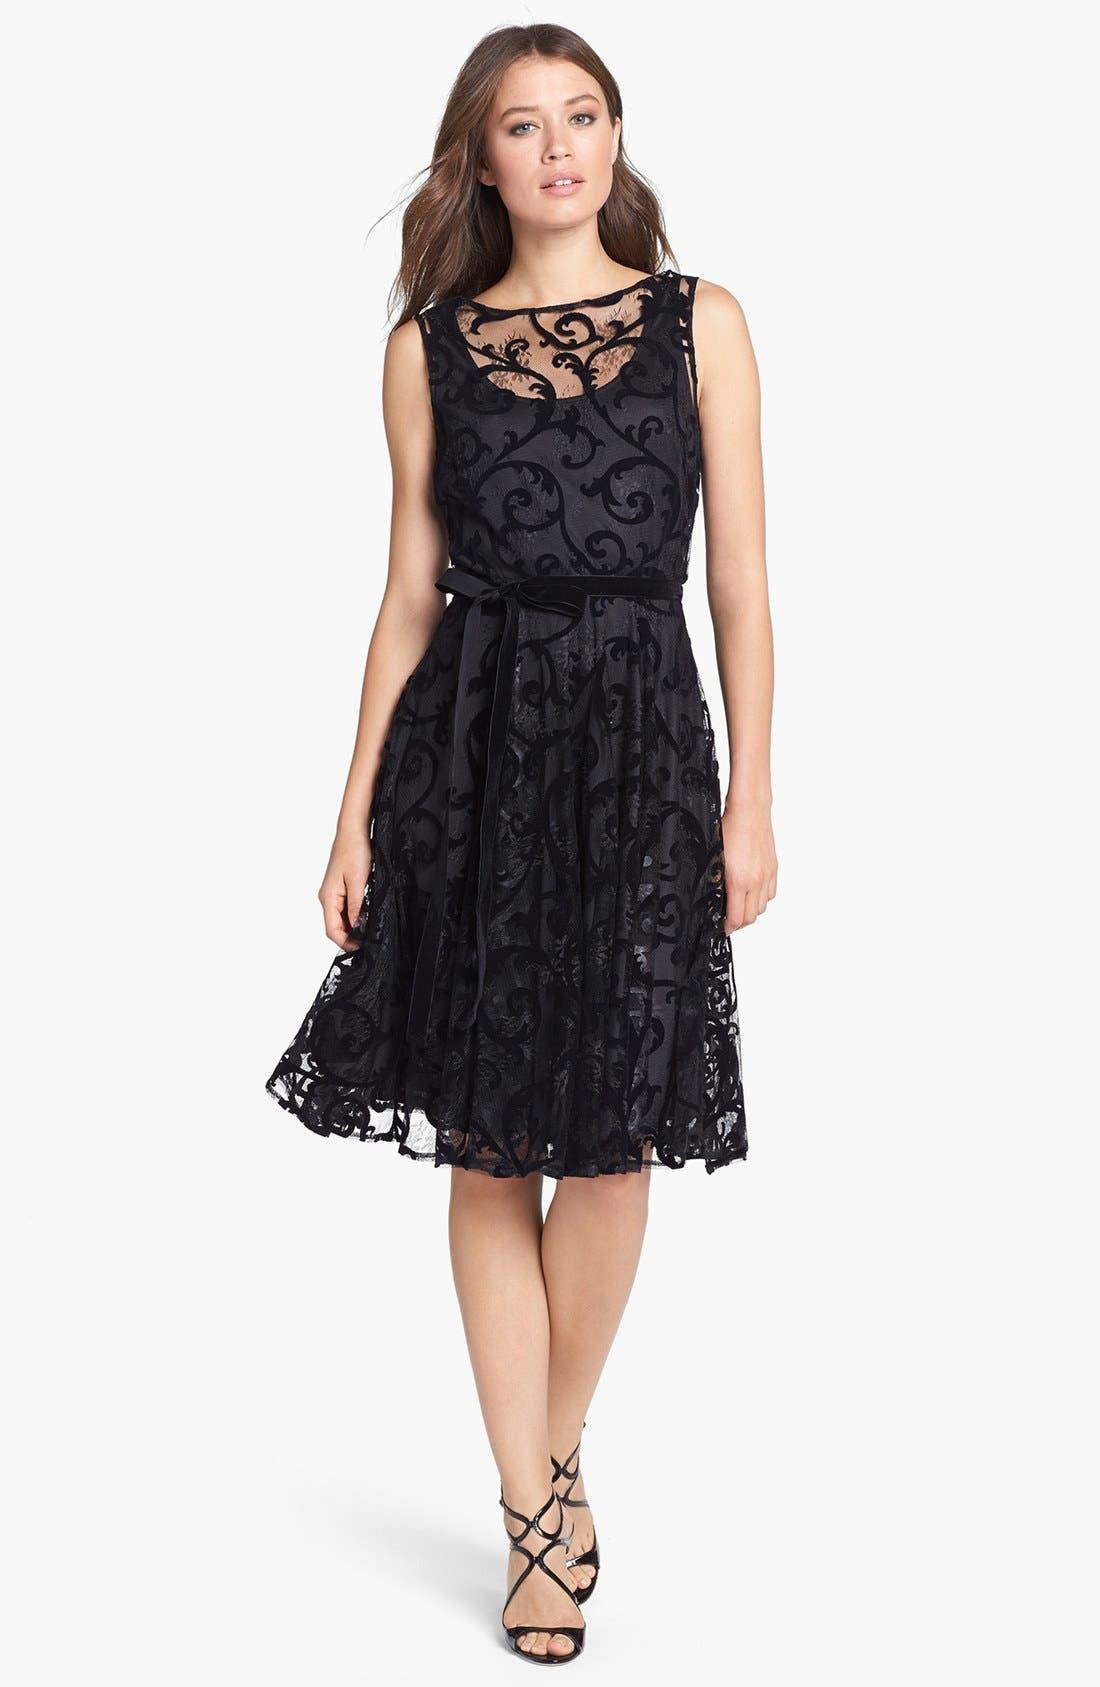 Alternate Image 1 Selected - Isaac Mizrahi New York Lace Burnout Fit & Flare Dress (Petite)